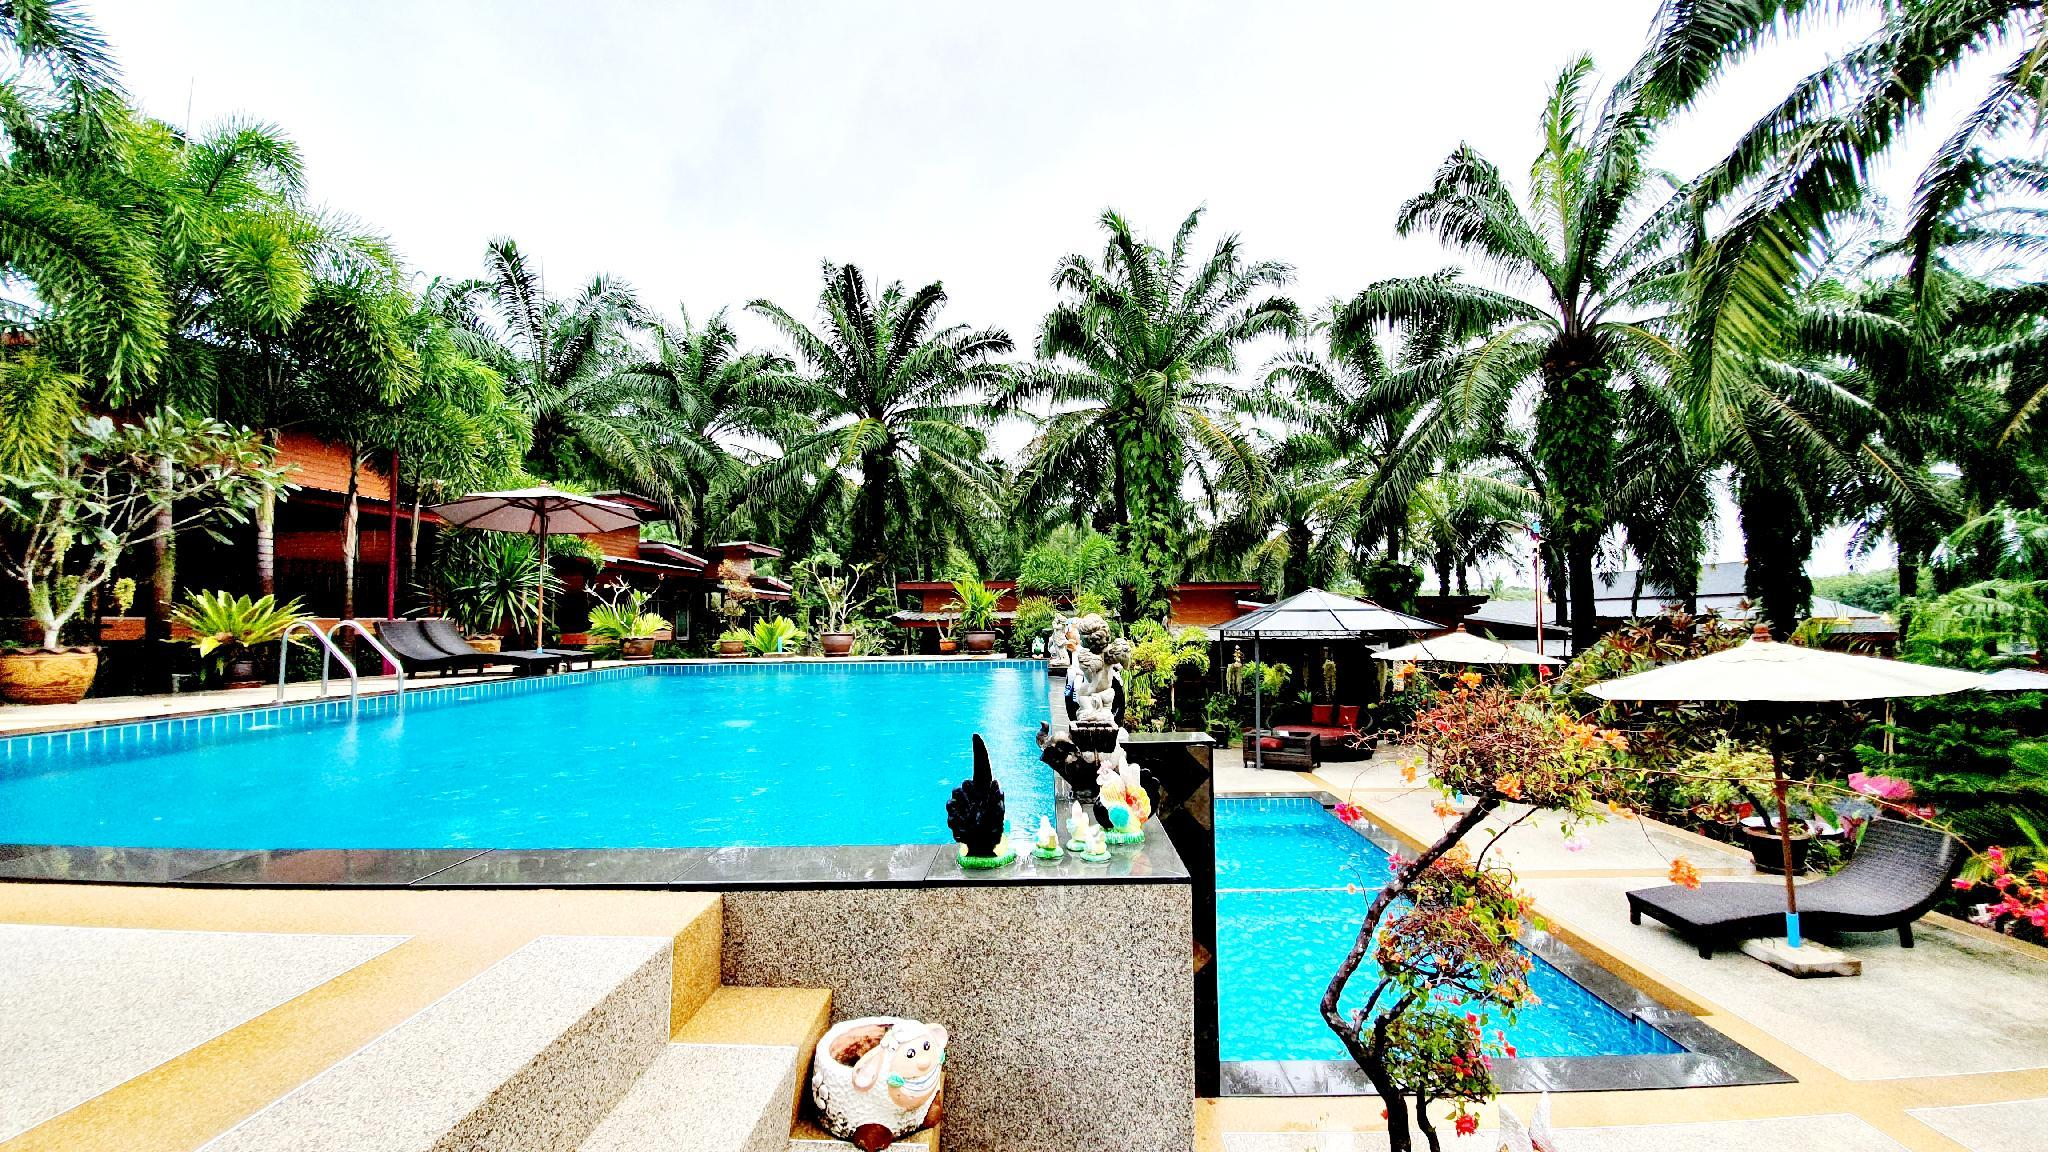 Palmthien Pool Villa Aonang